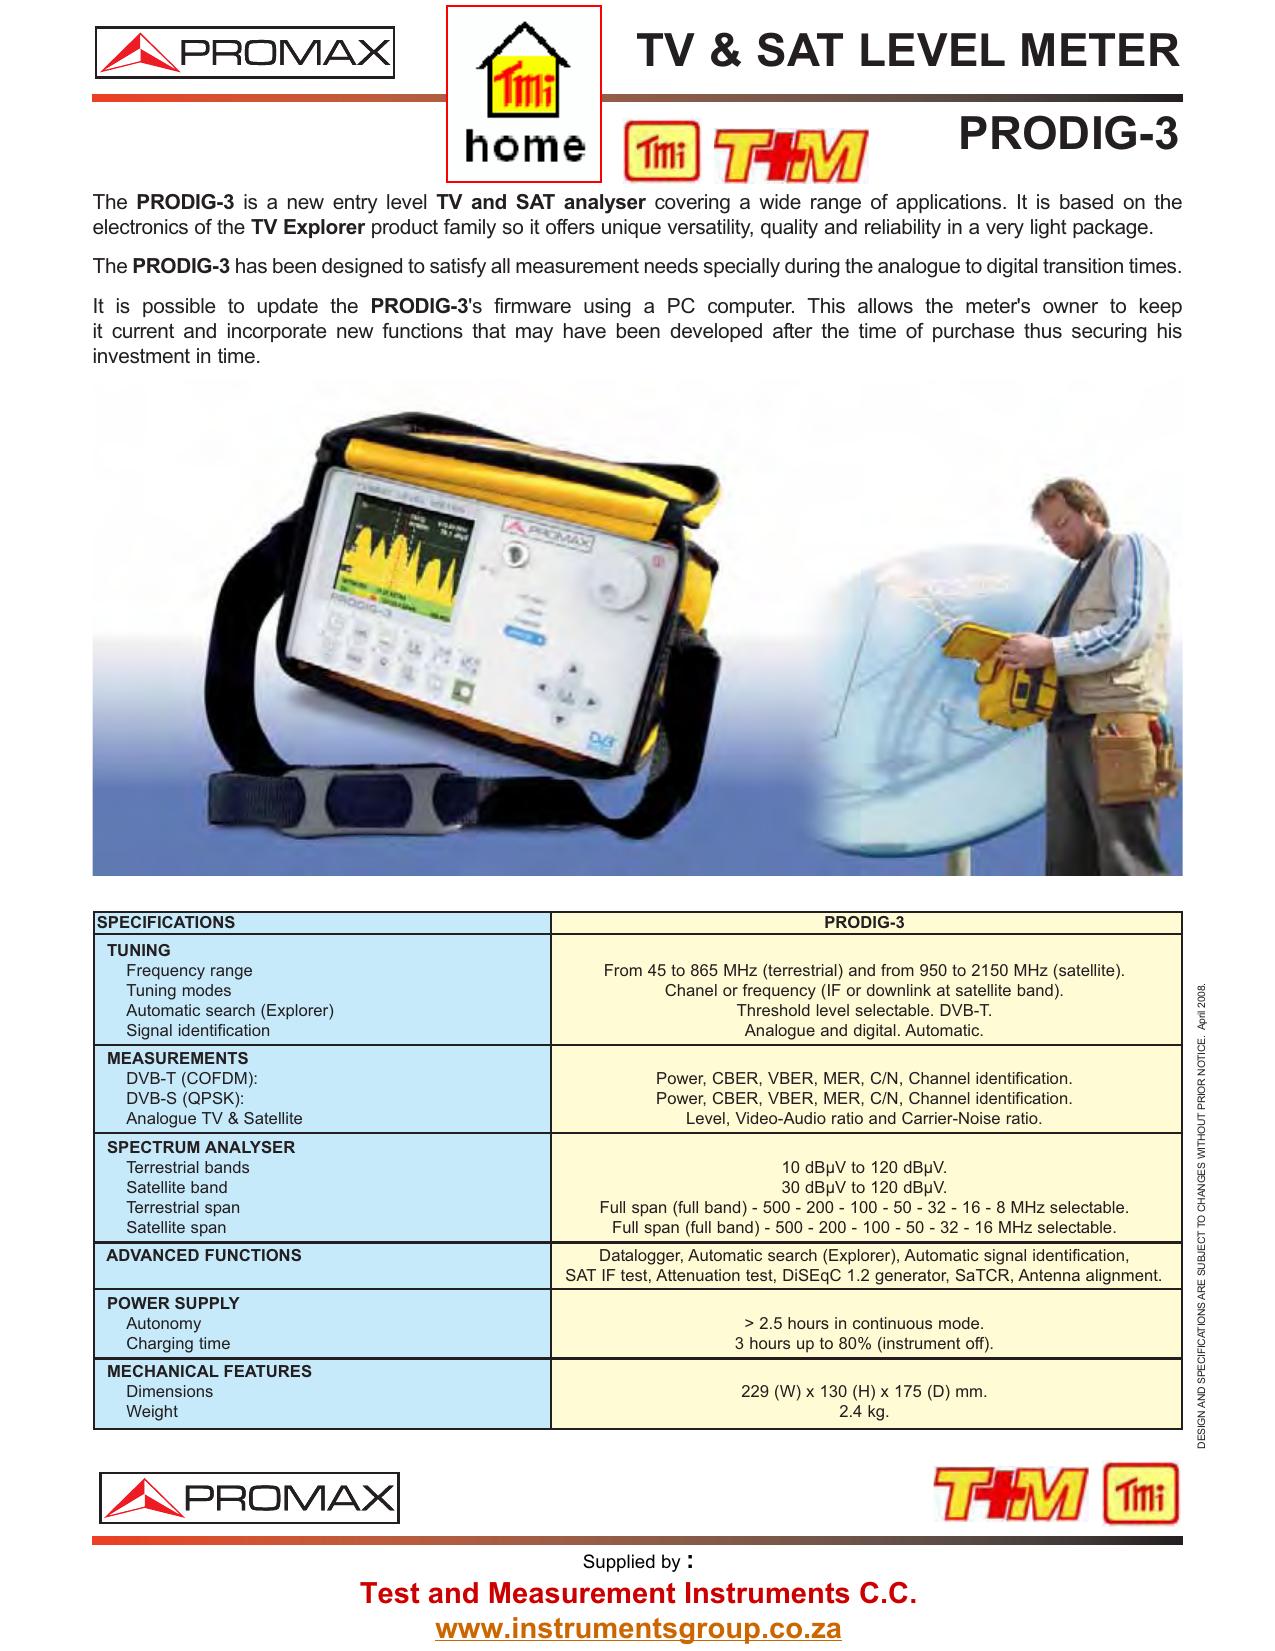 PRODIG-3 - Test and Measurement Instruments CC | manualzz com